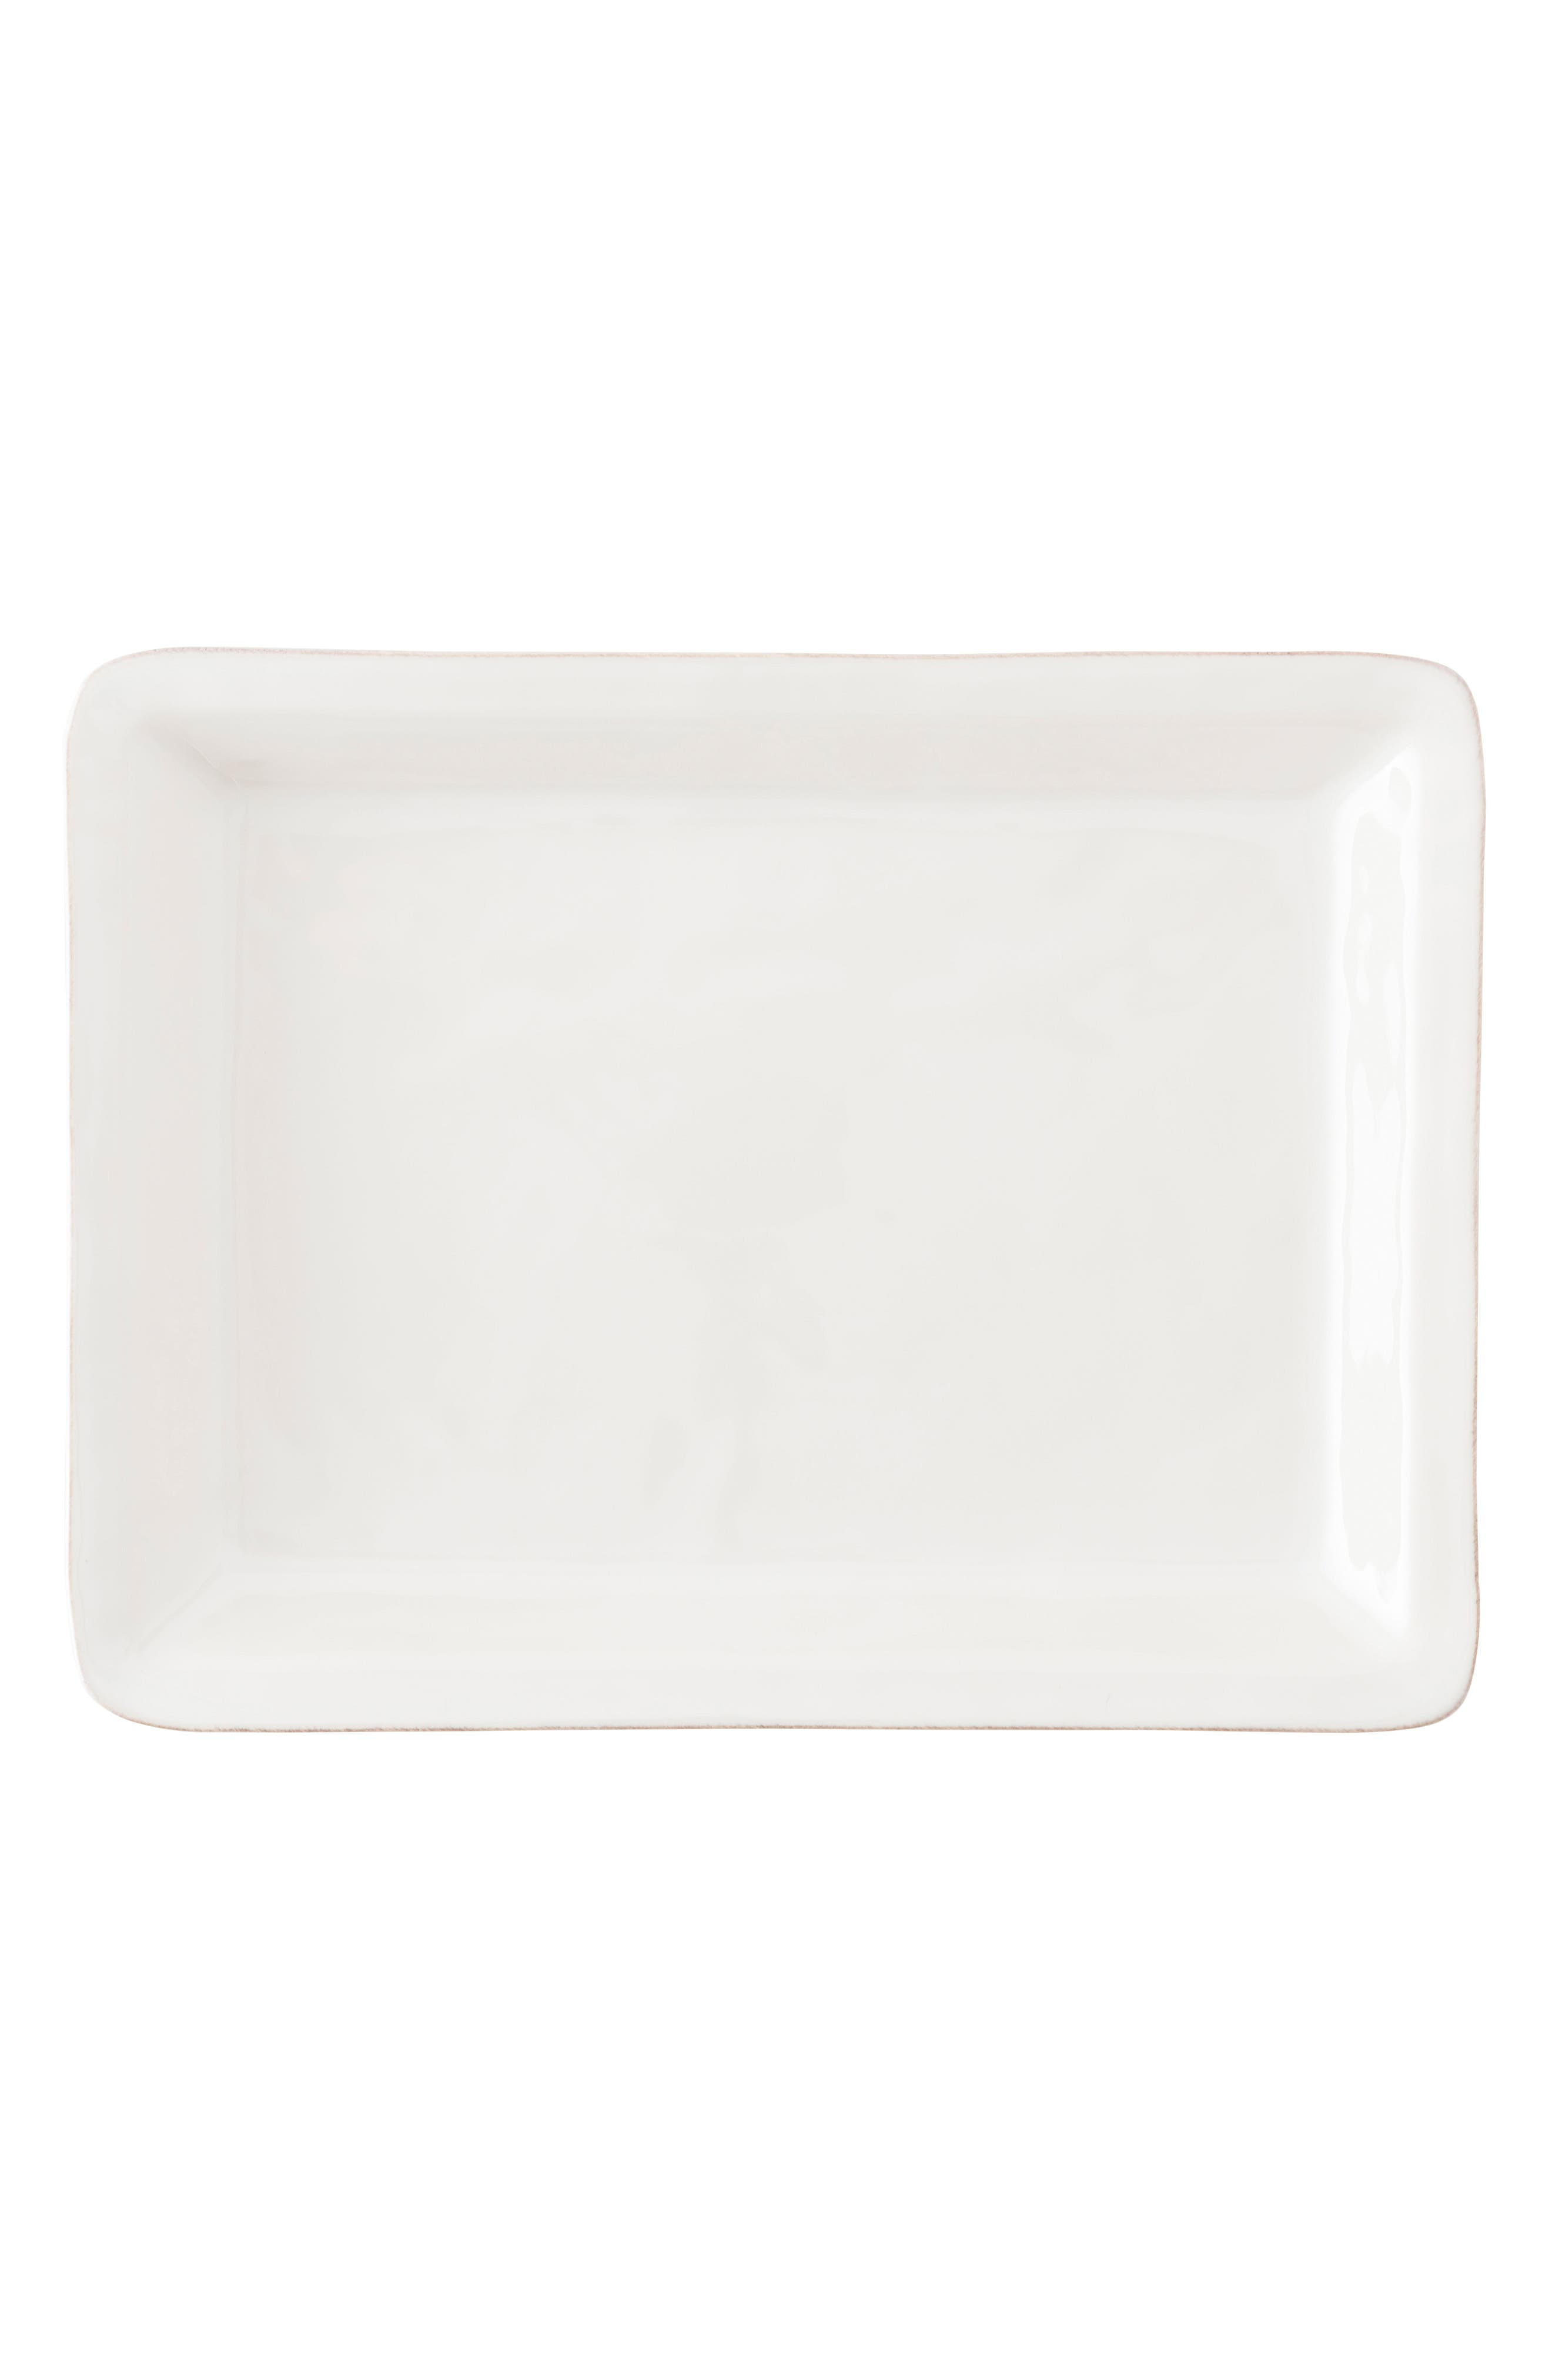 Alternate Image 1 Selected - Juliska Puro Large Ceramic Serving Tray